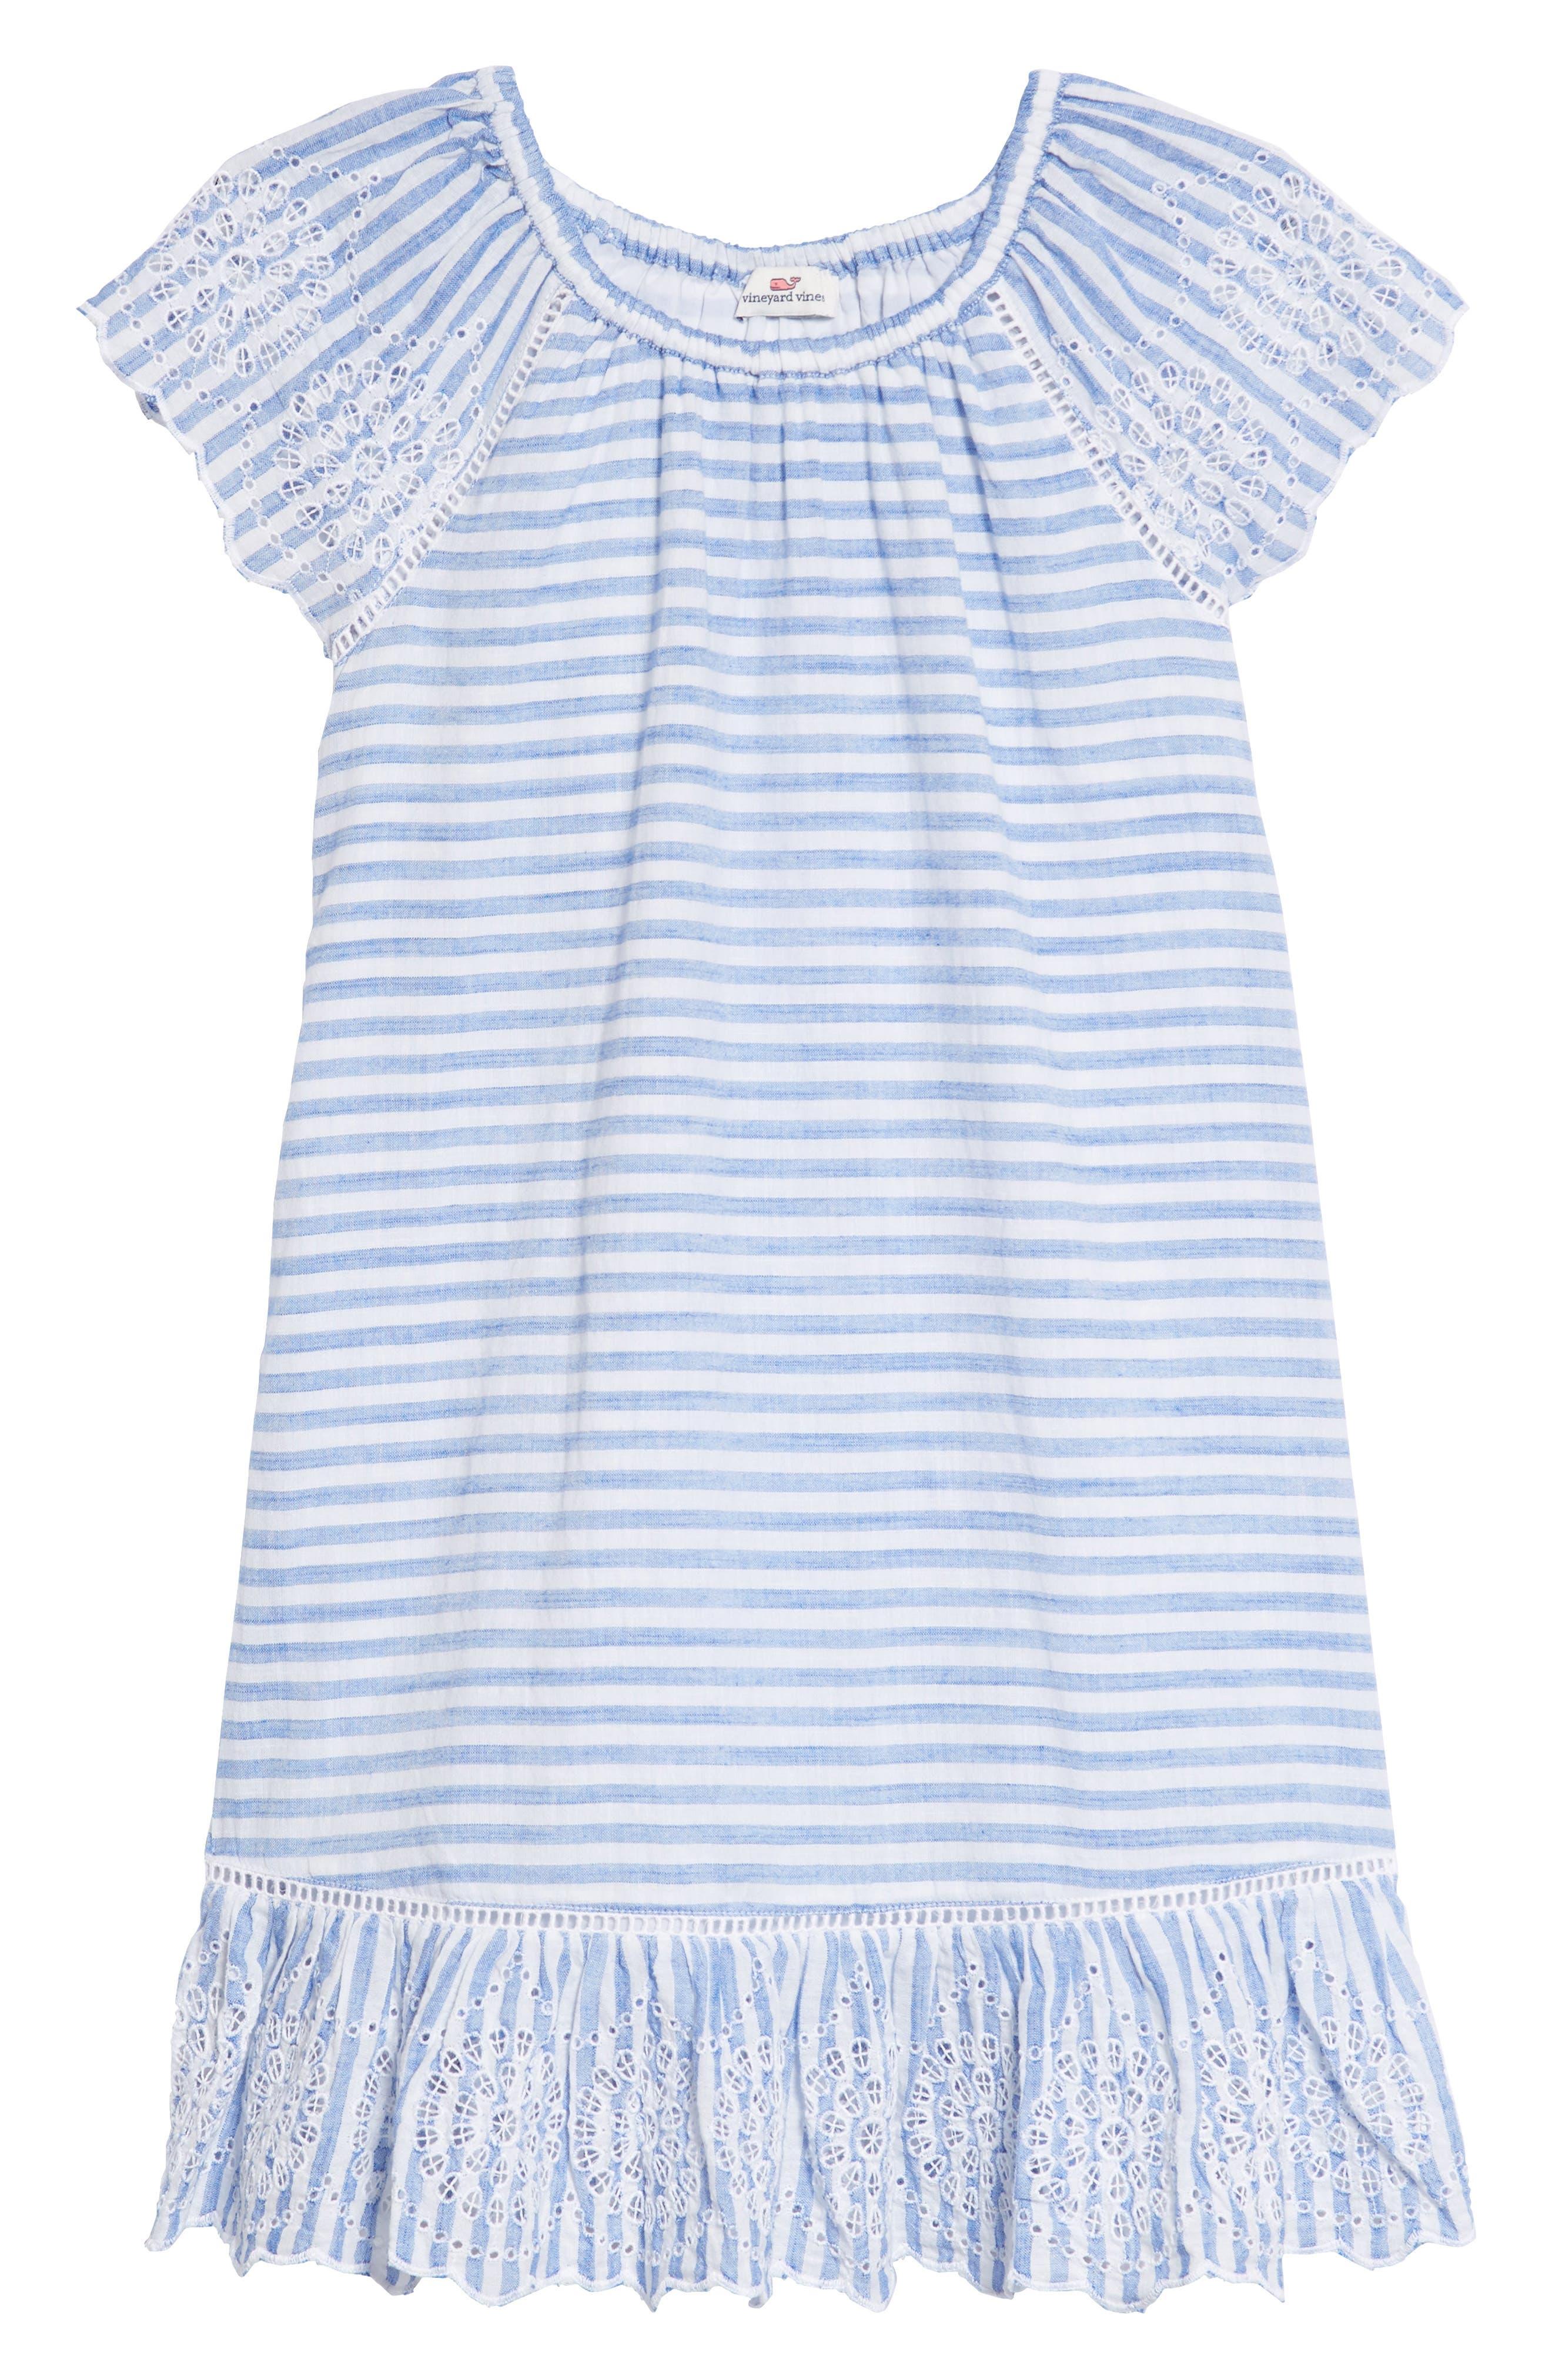 Alternate Image 1 Selected - vineyard vines Stripe Eyelet Dress (Little Girls & Big Girls)